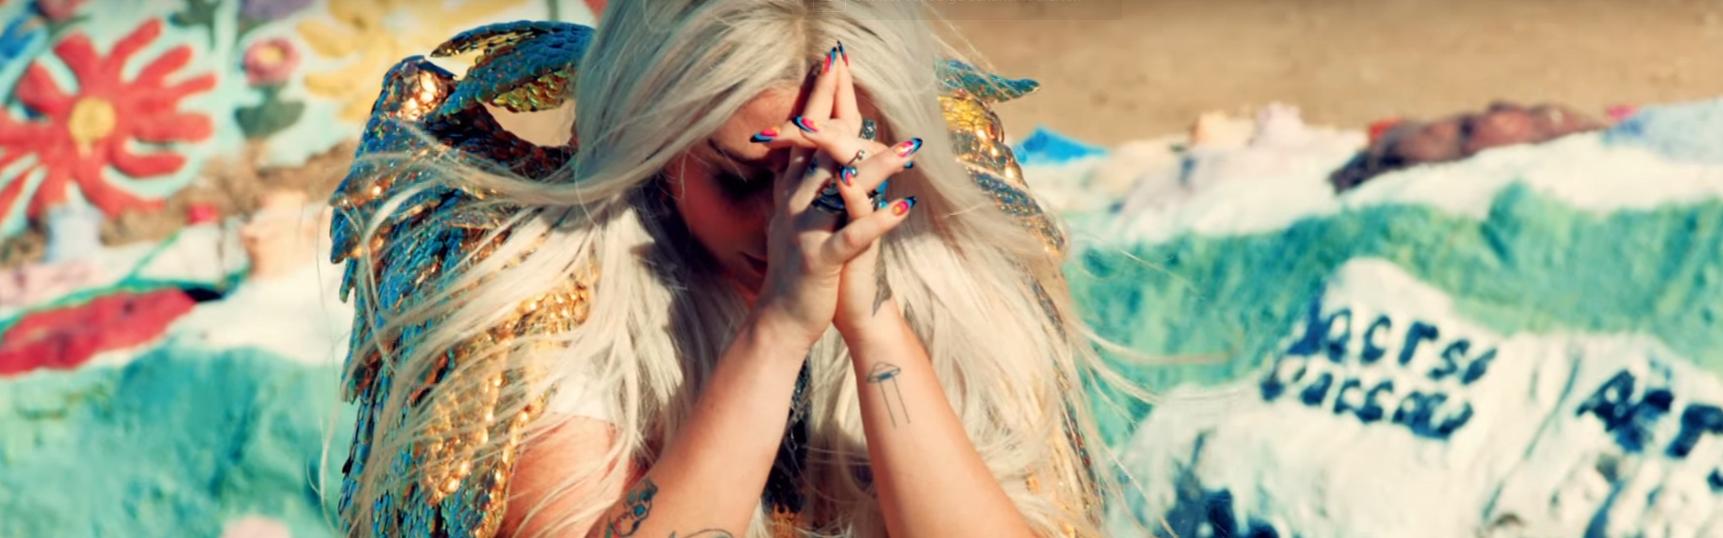 Kesha header